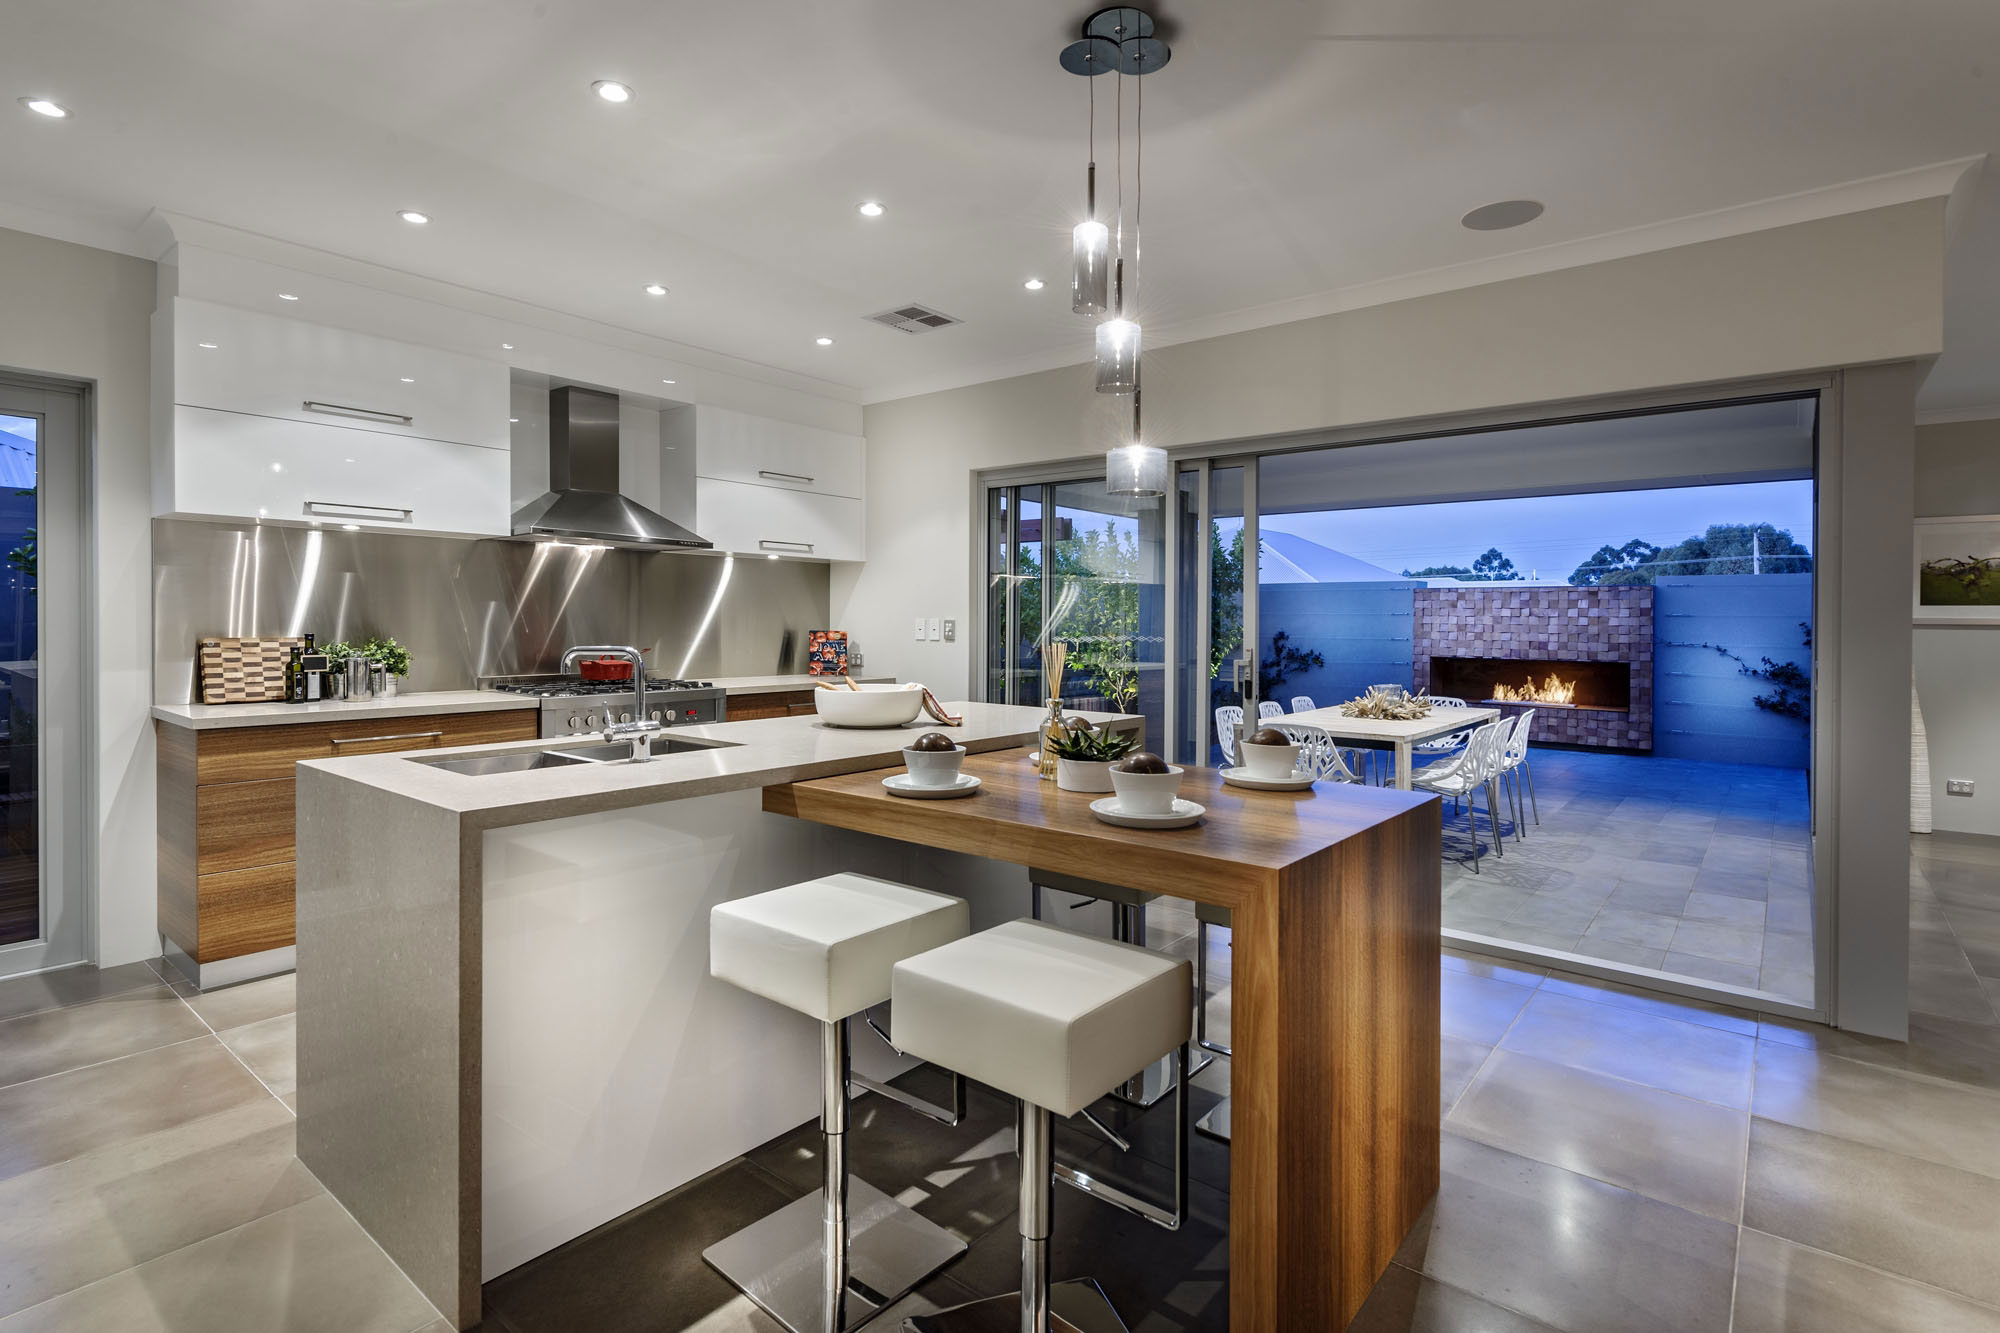 Kitchen Island, Breakfast Bar, Pendant Lighting, Glass Sliding Doors, Modern Home in Wandi, Perth